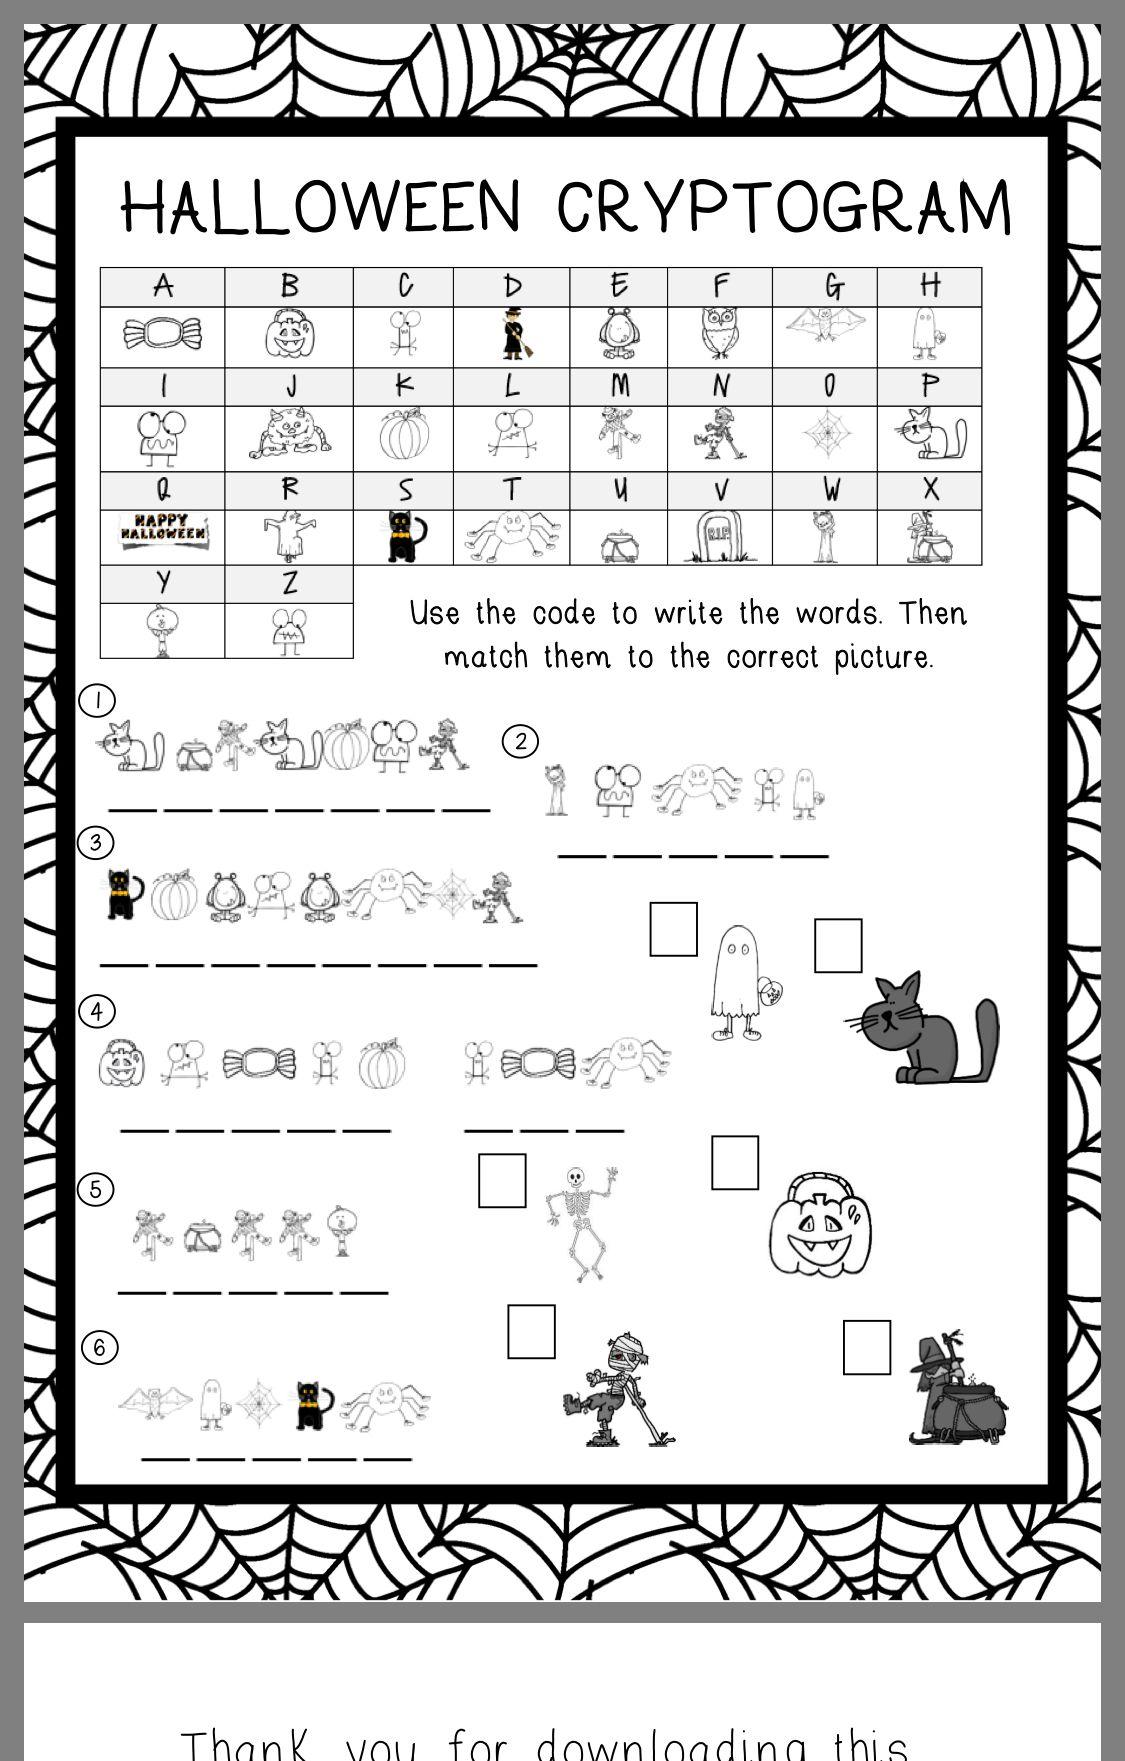 7 Free Days Of The Week Cursive Handwriting Worksheets